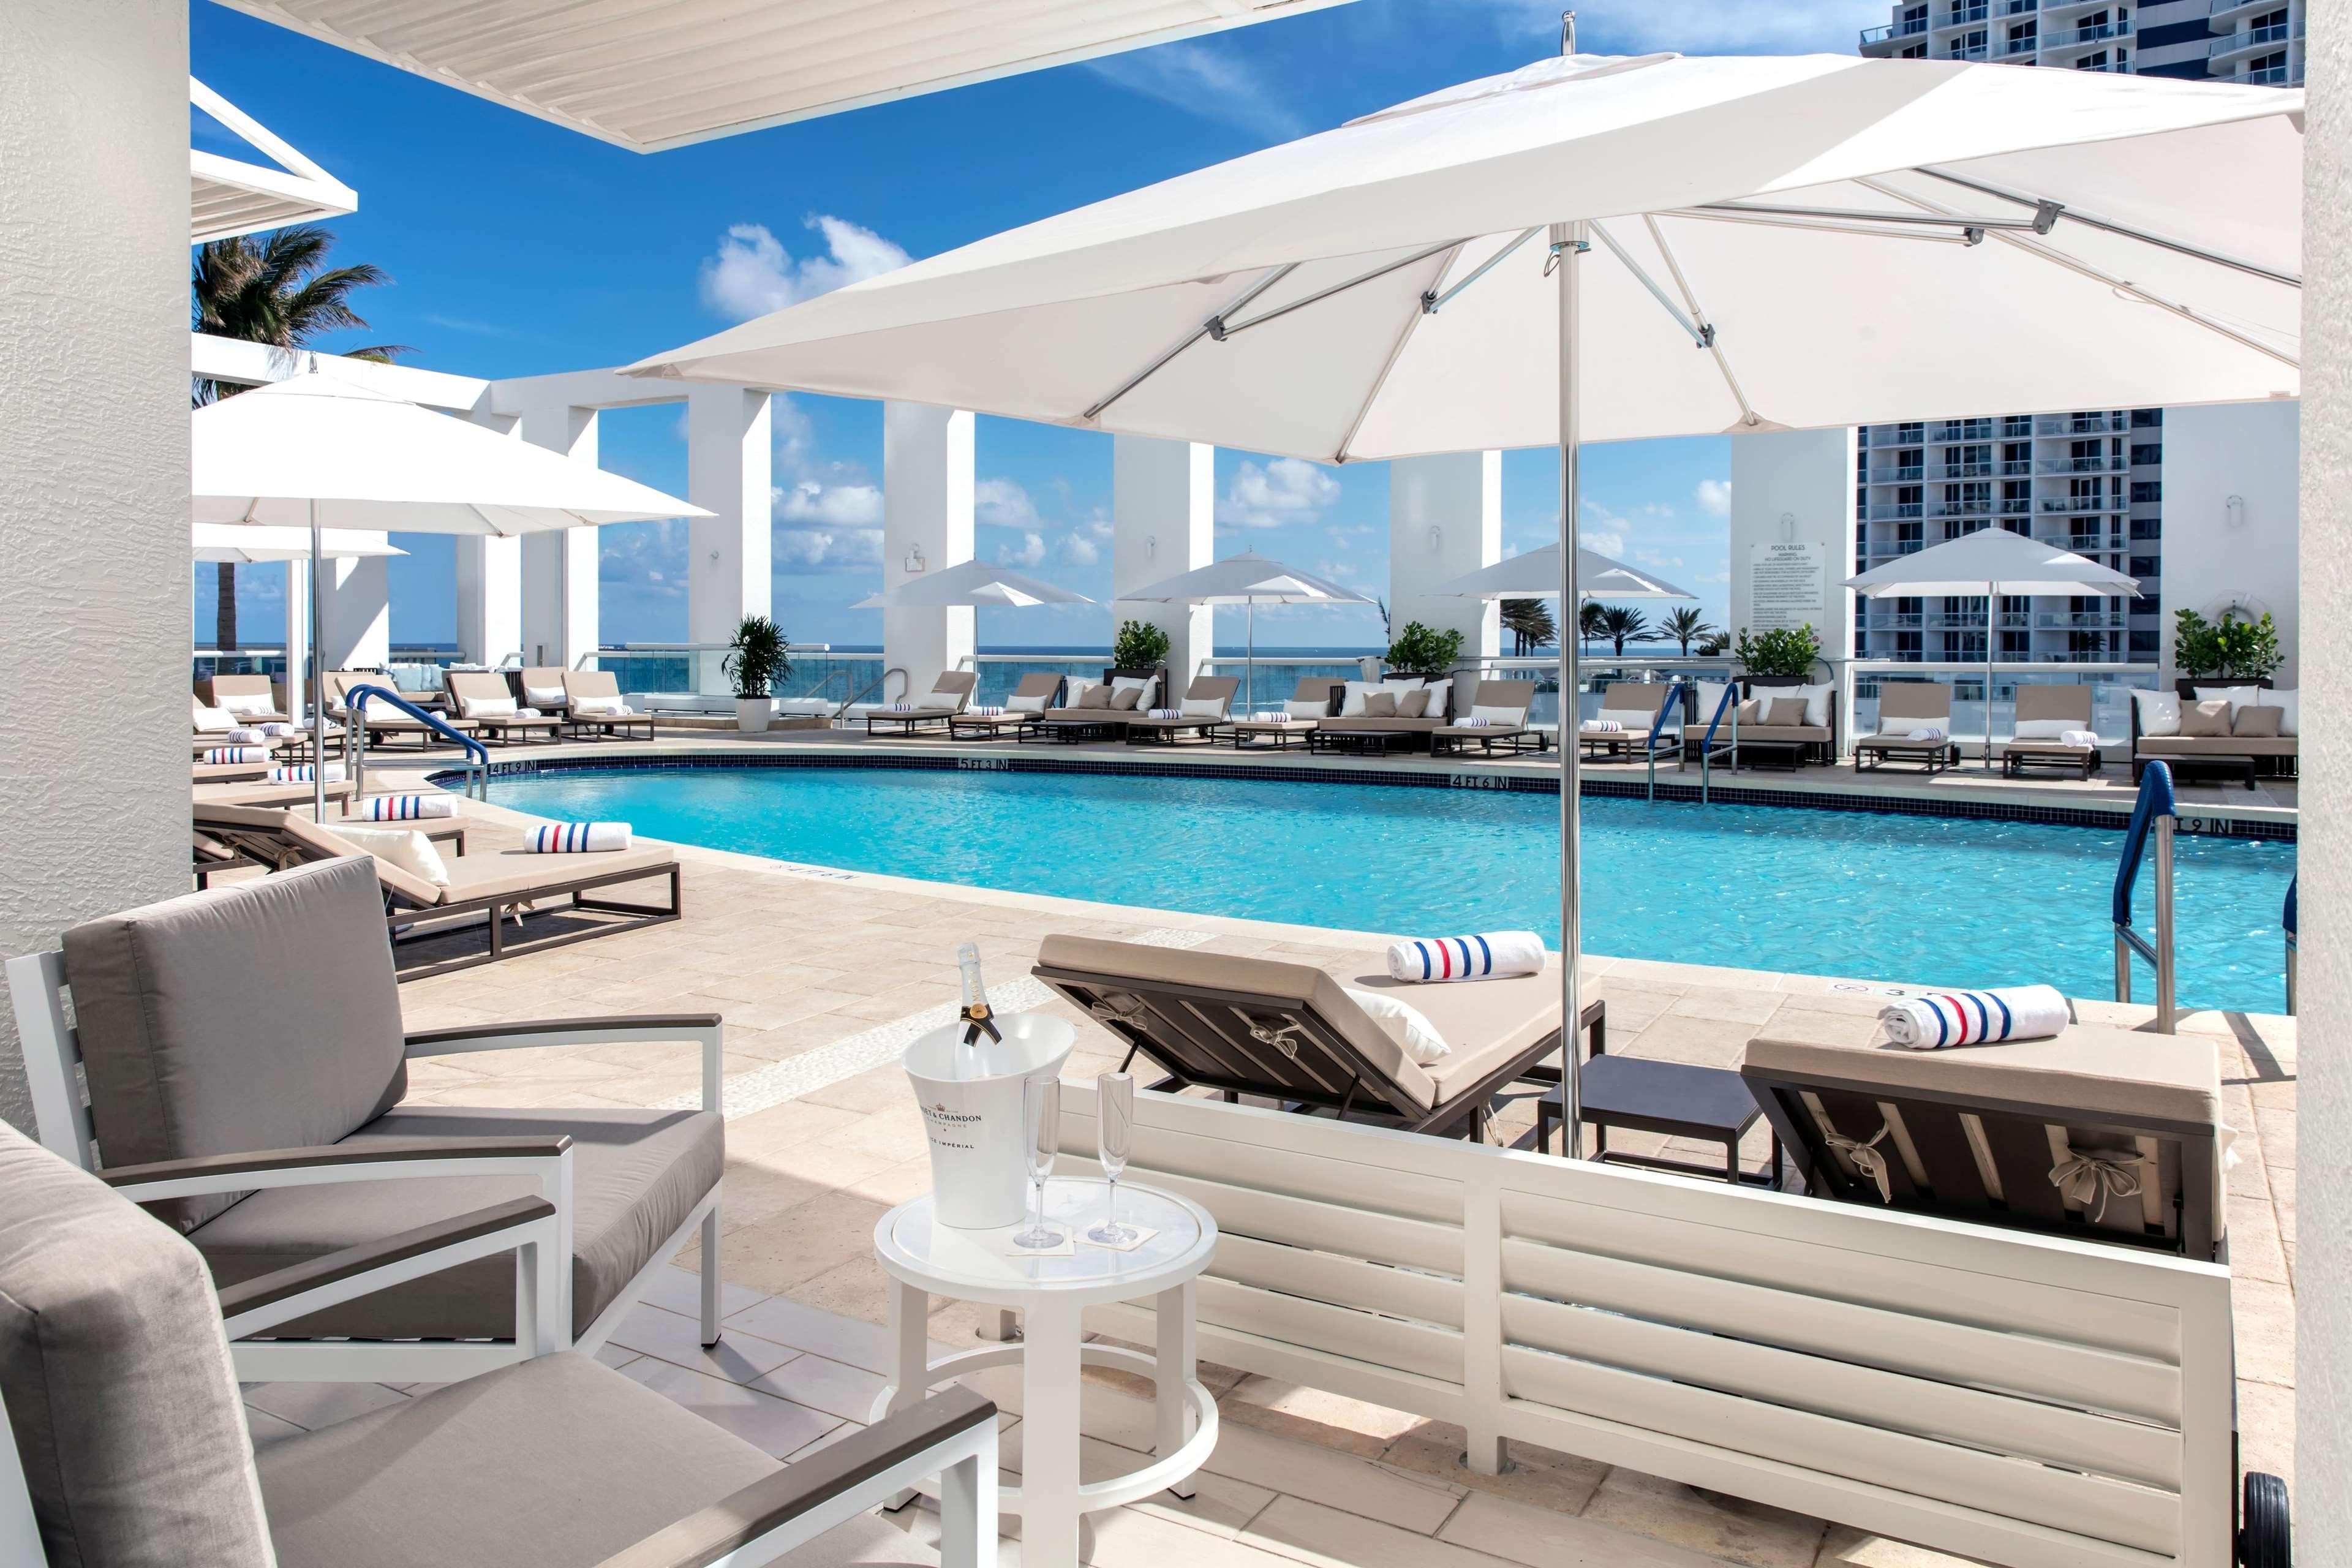 Conrad Fort Lauderdale Beach image 16